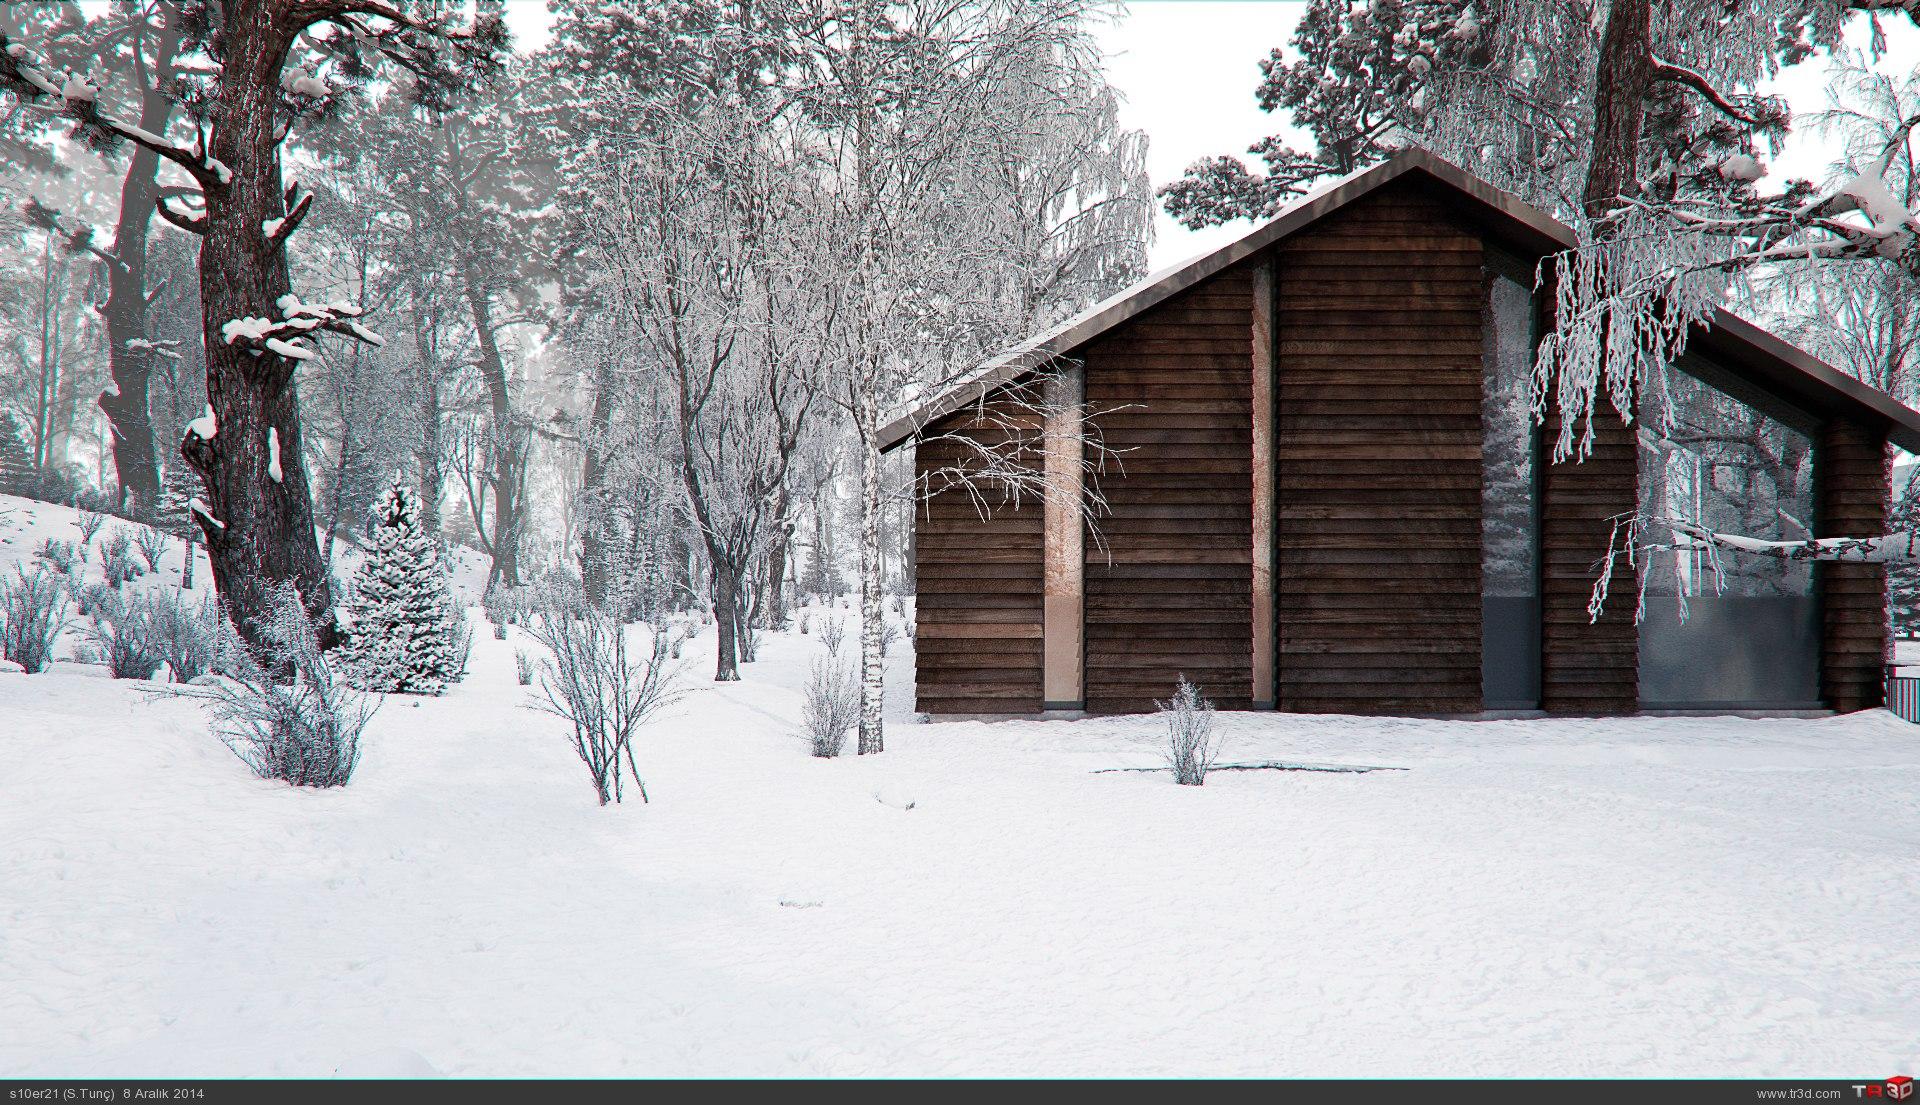 Ahsap orman evi